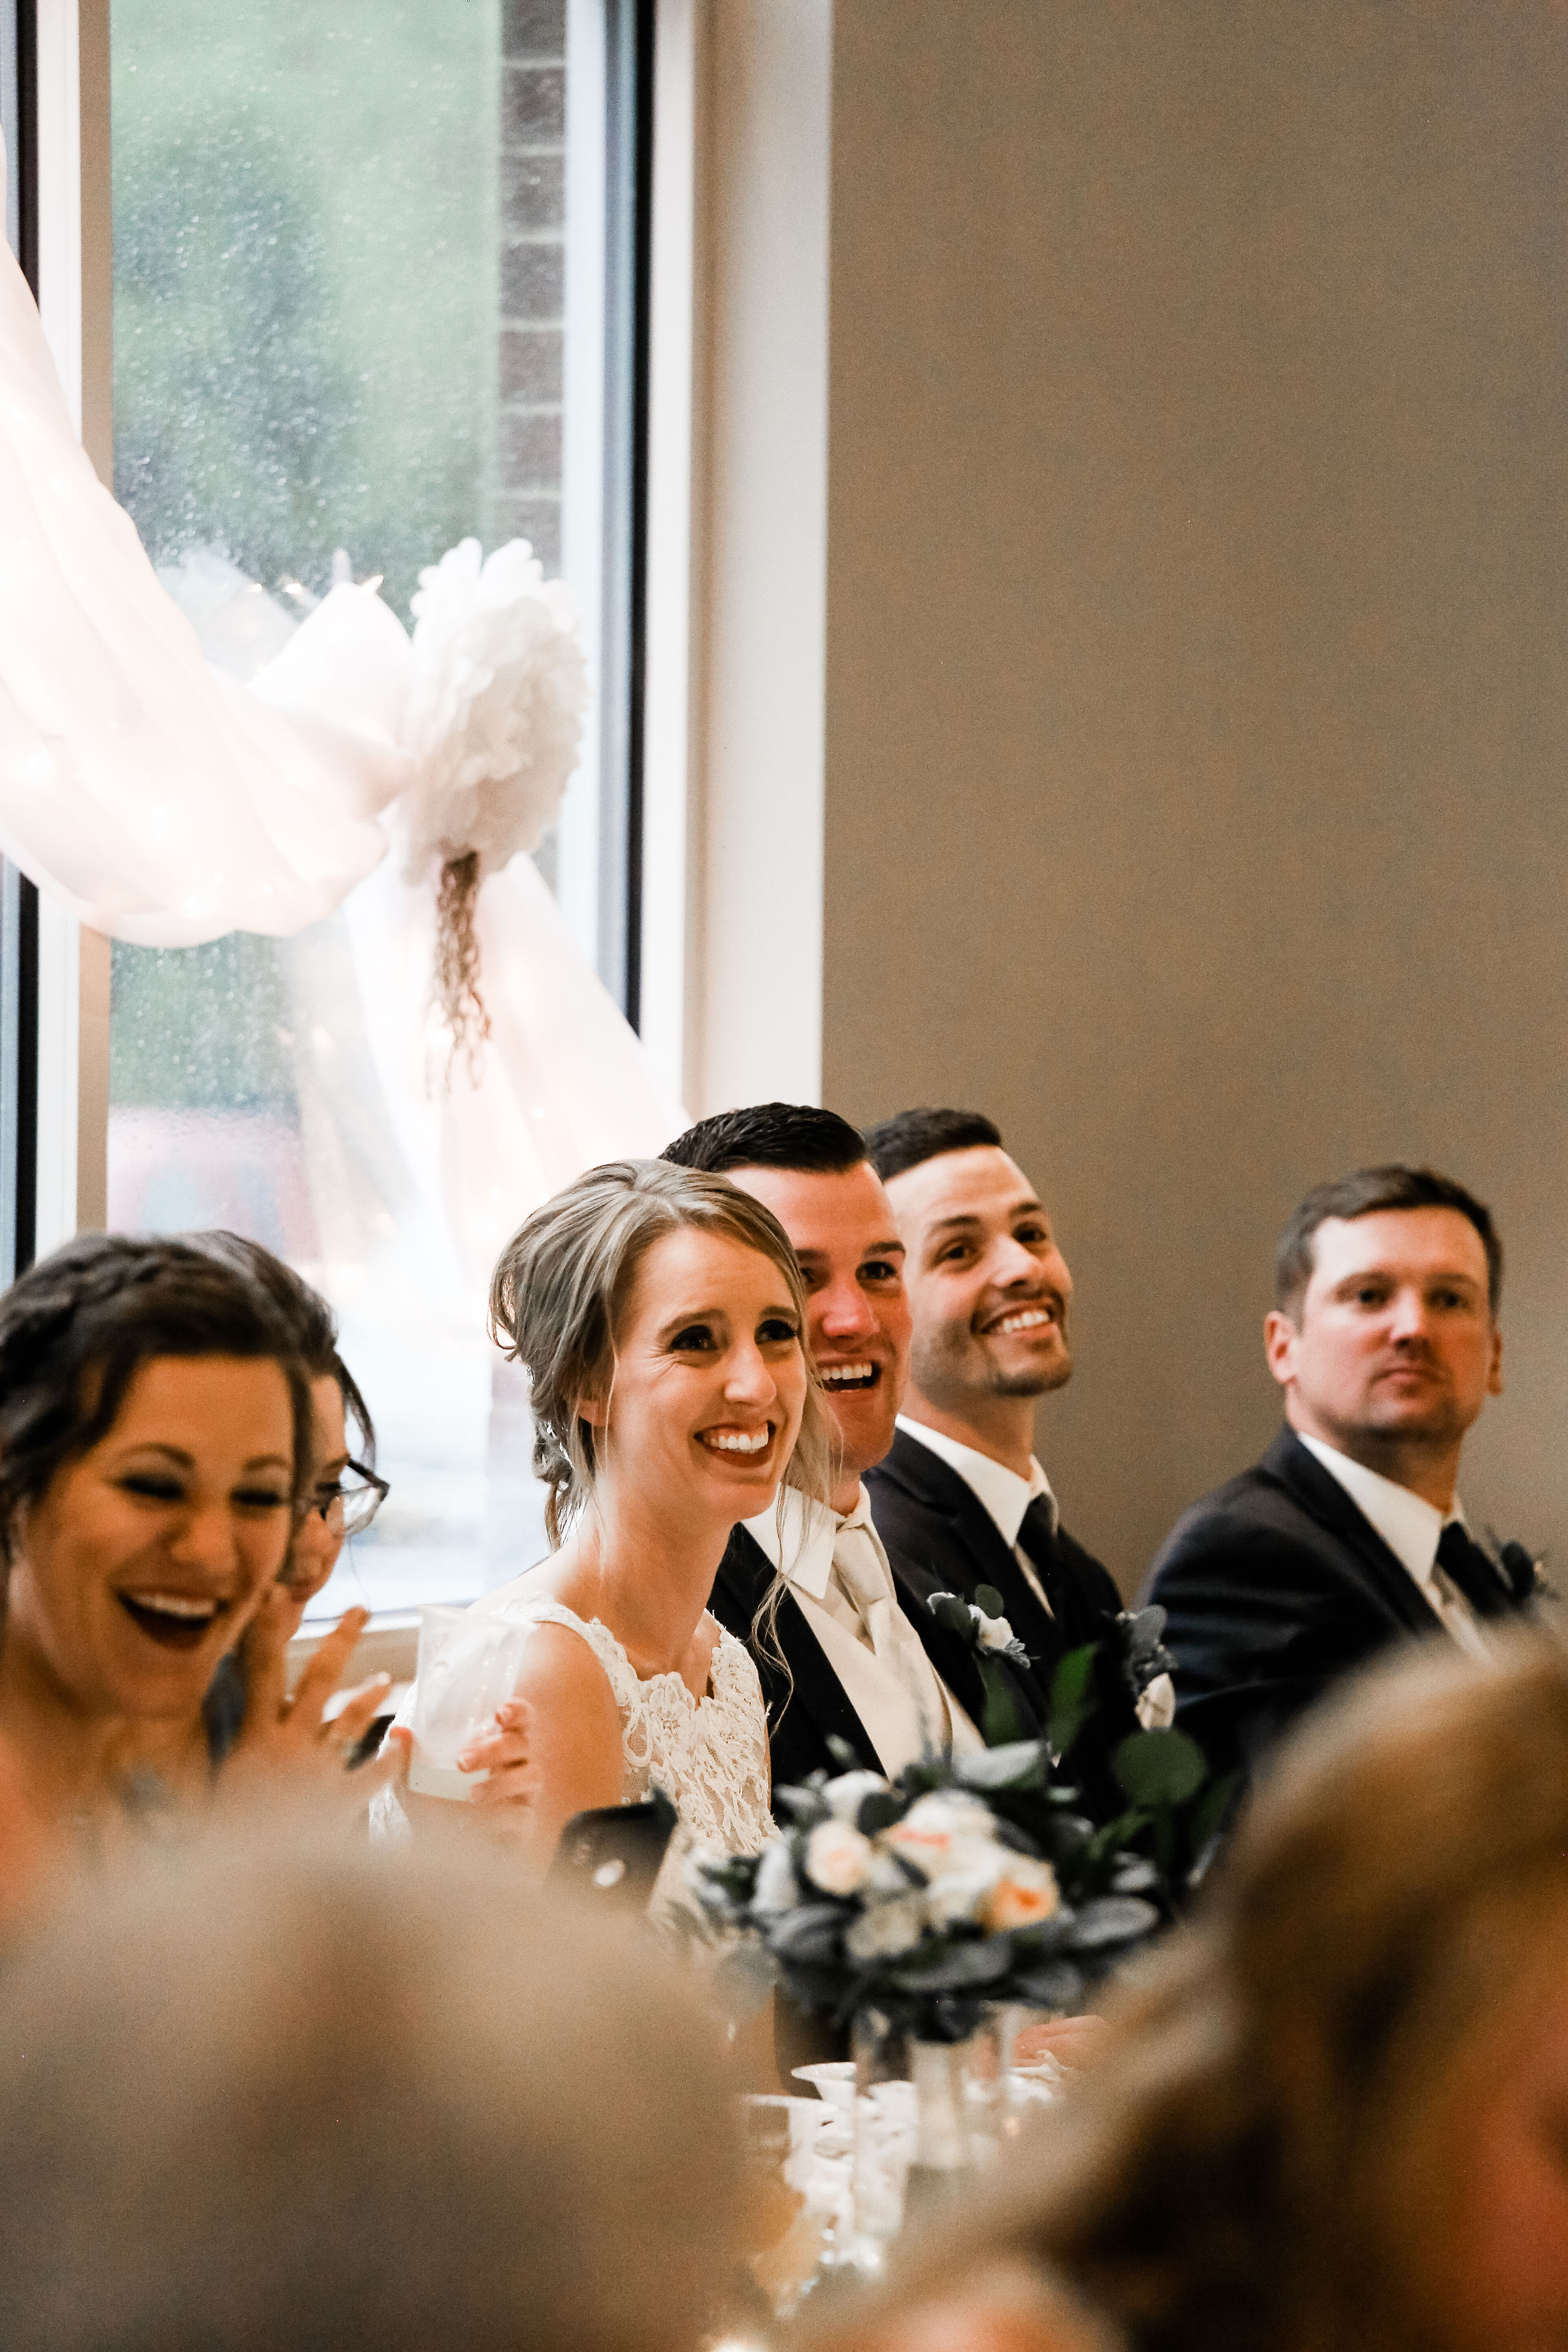 danandtonia-156katie_graham_photography_luxury_fine_art_destination_wedding_photographer_bemus_point_chautauqua_institution_chautauqua_lake_mayville_lakewood_buffalo_new_york_erie_pennsylvania6.jpg